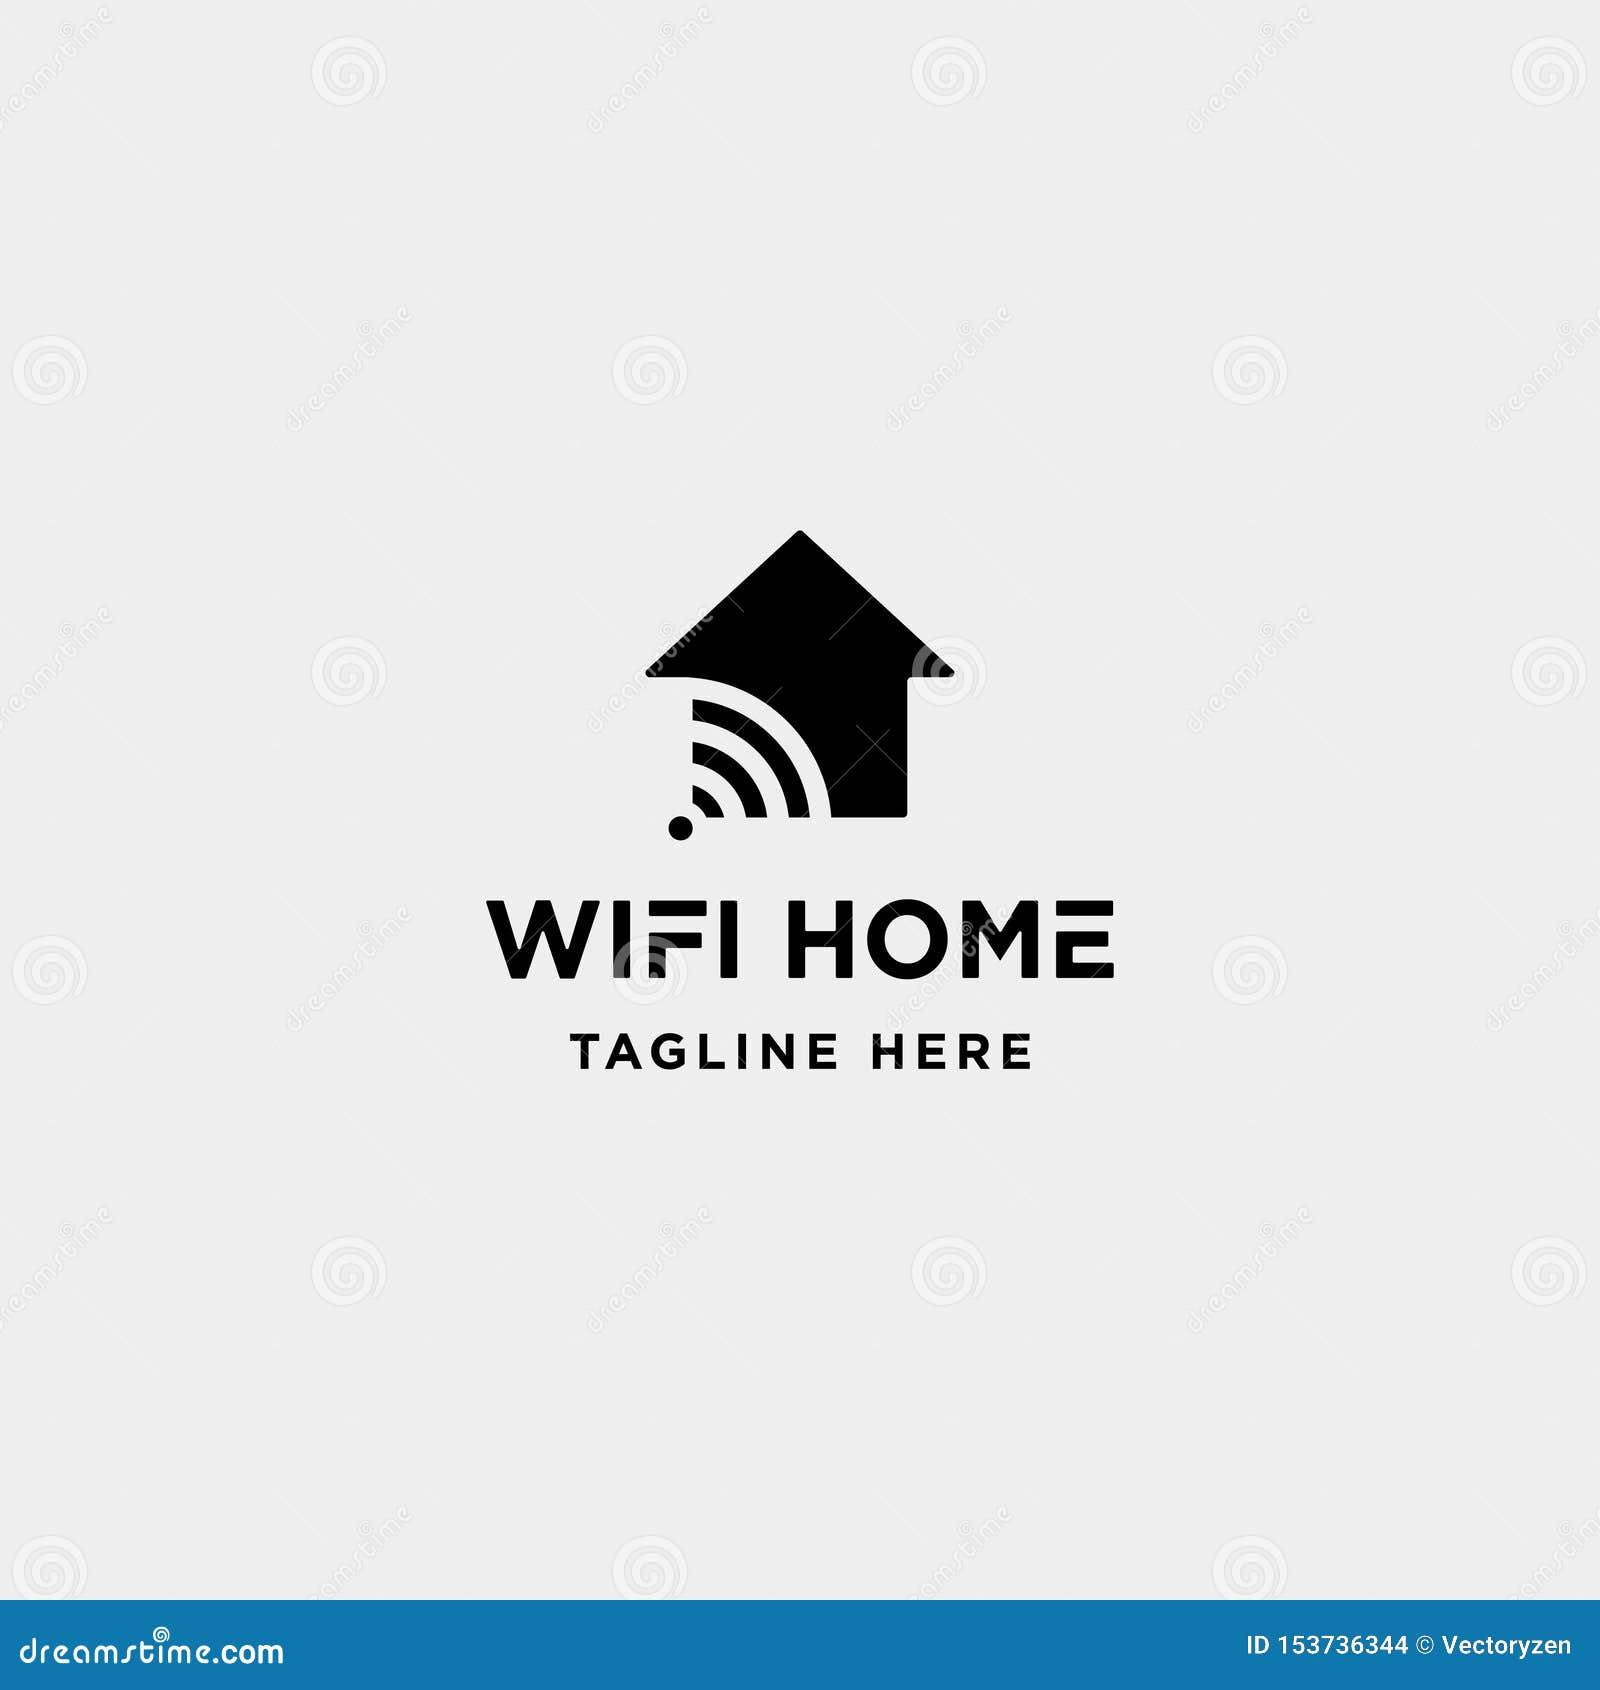 Home Internet Logo Design Vector Wifi House Icon Siymbol Sign Stock Vector Illustration Of Wifi Logo 153736344